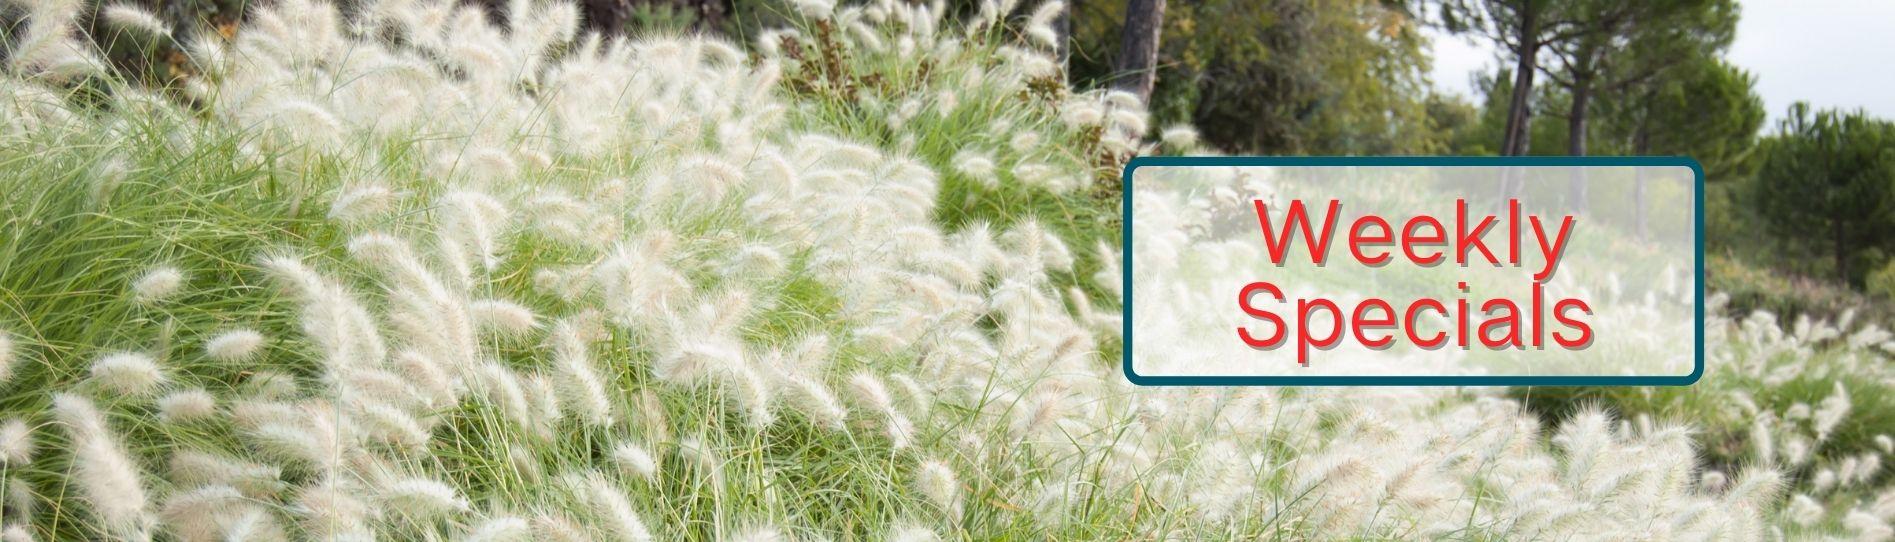 Ornamental Grasse Weekly Specials Banner